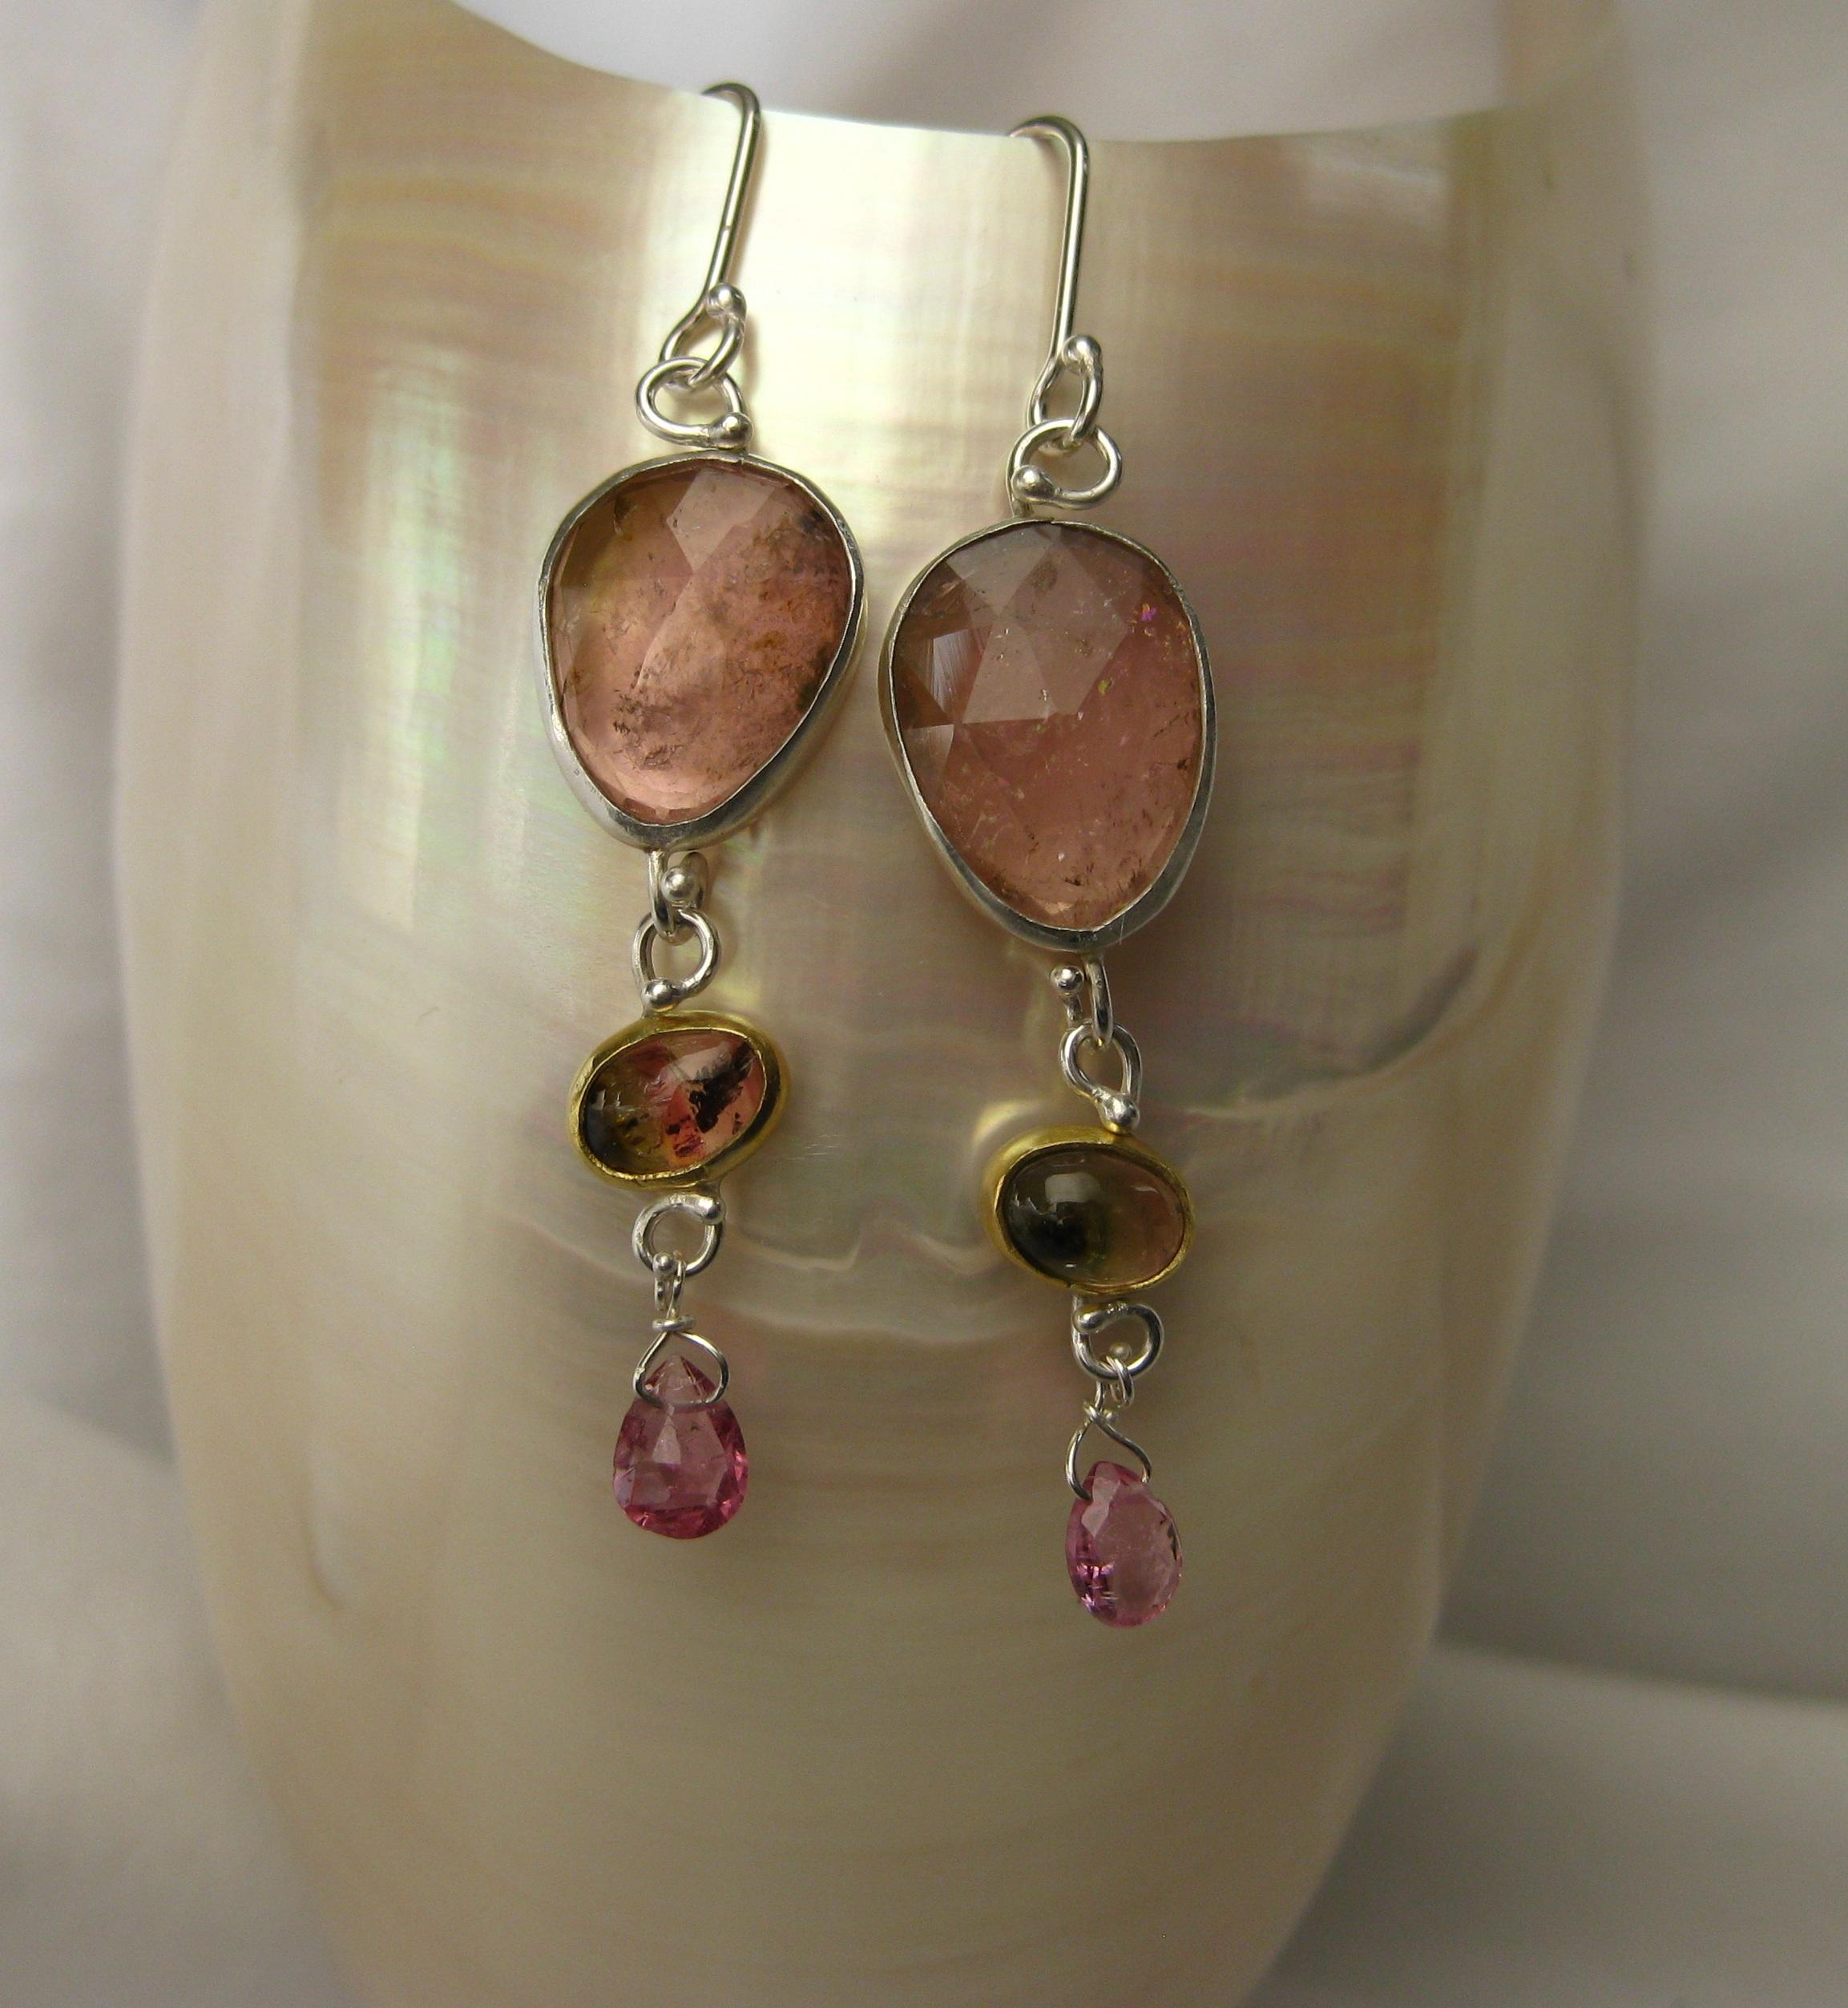 Rose Cut Pink Tourmaline & Watermelon Tourmaline Earrings with Deep Pink Briolettes